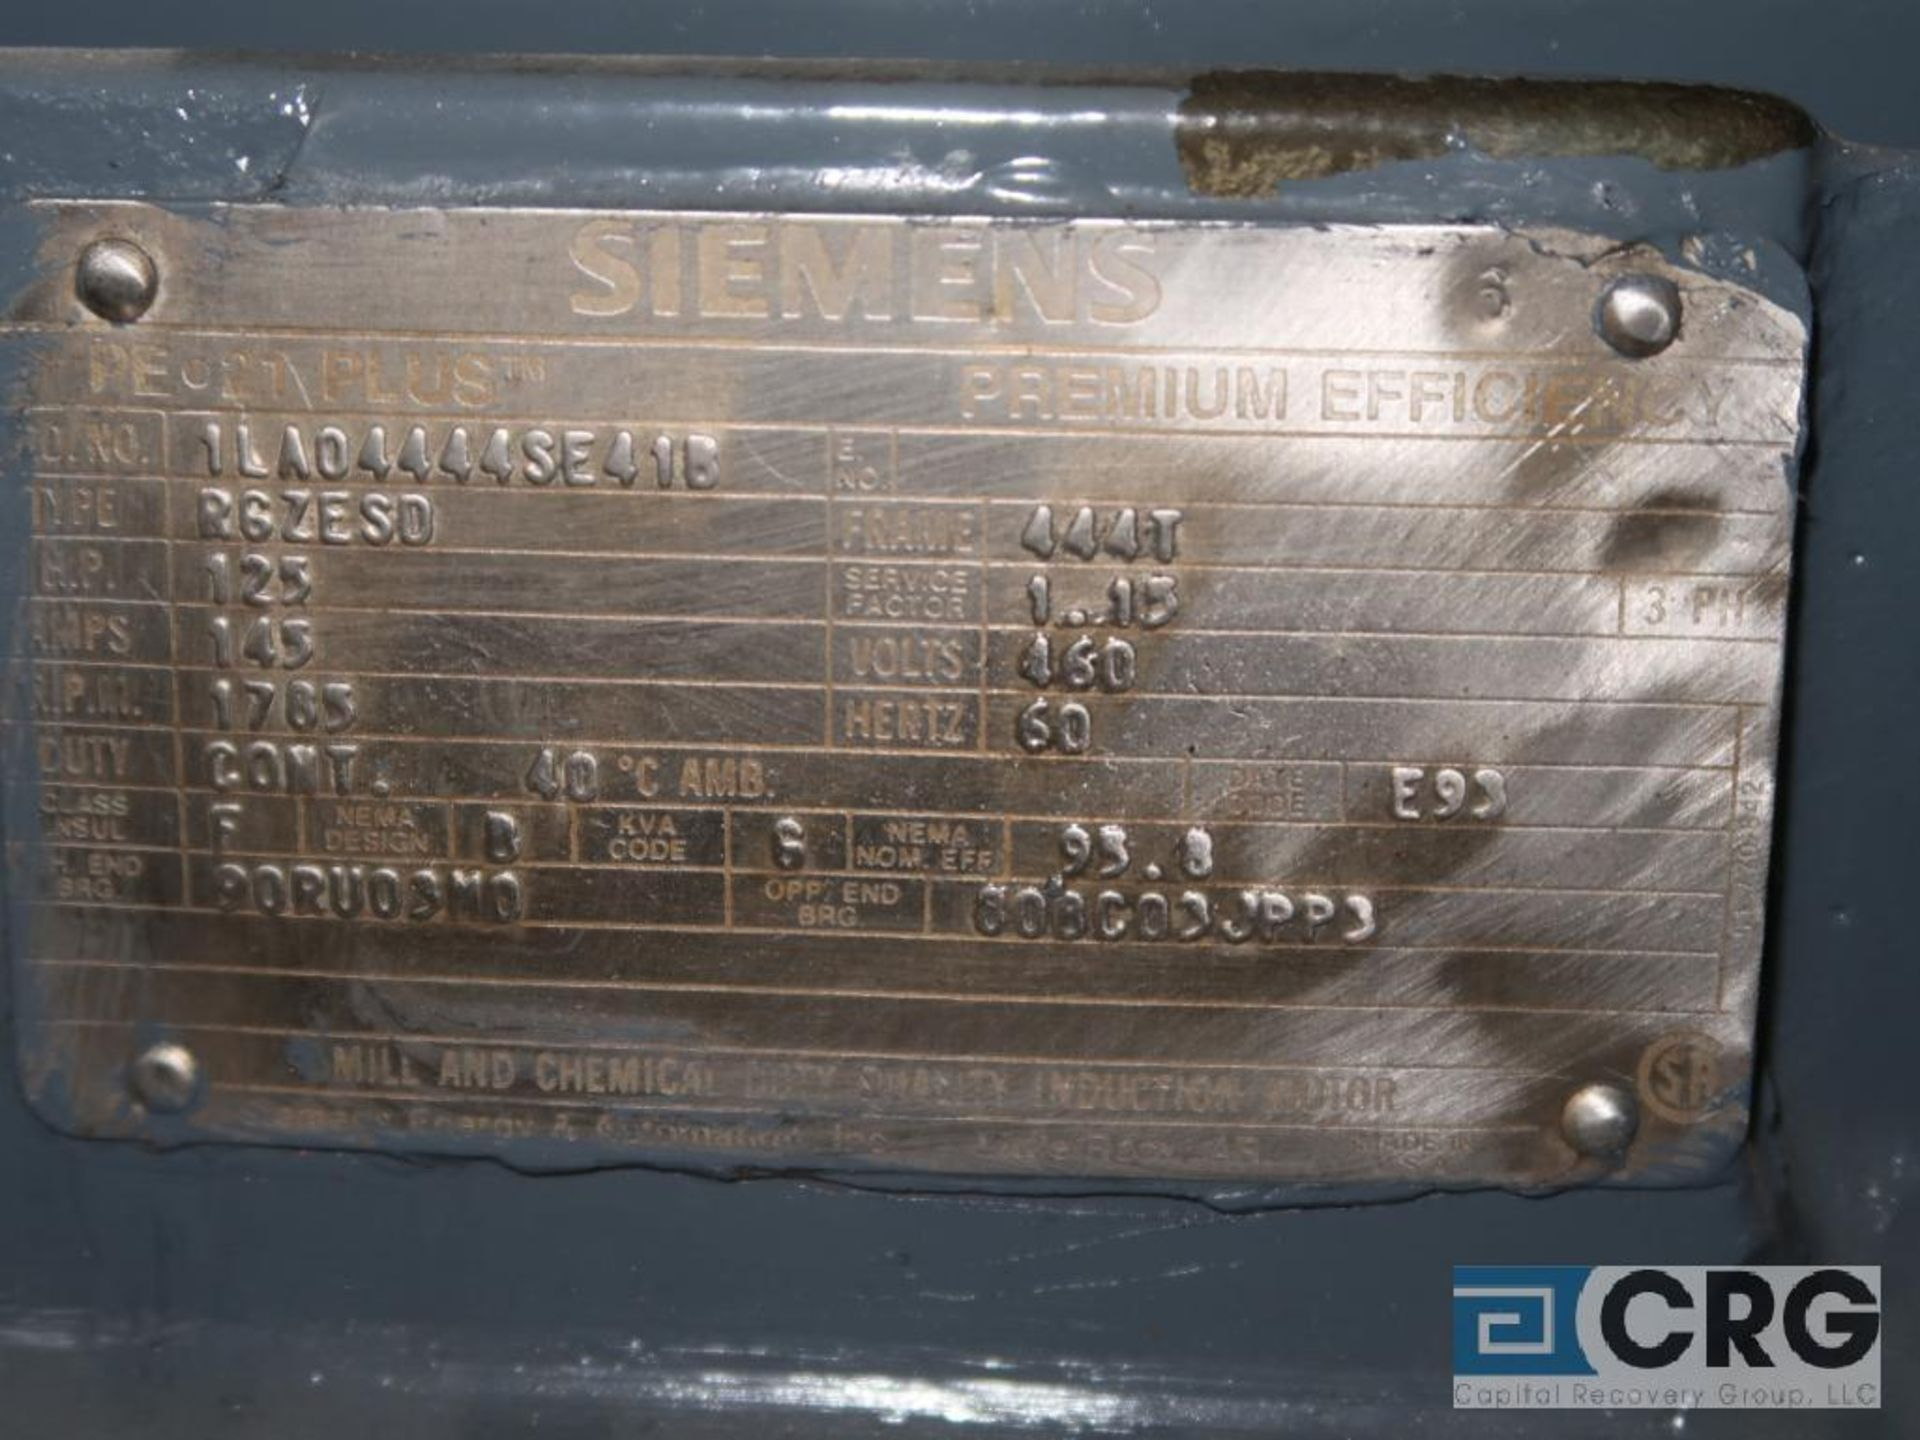 Siemens PE-21 PLUS motor, 125 HP, 1,785 RPMs, 460 volt, 3 ph., 444T frame (Finish Building) - Image 2 of 2